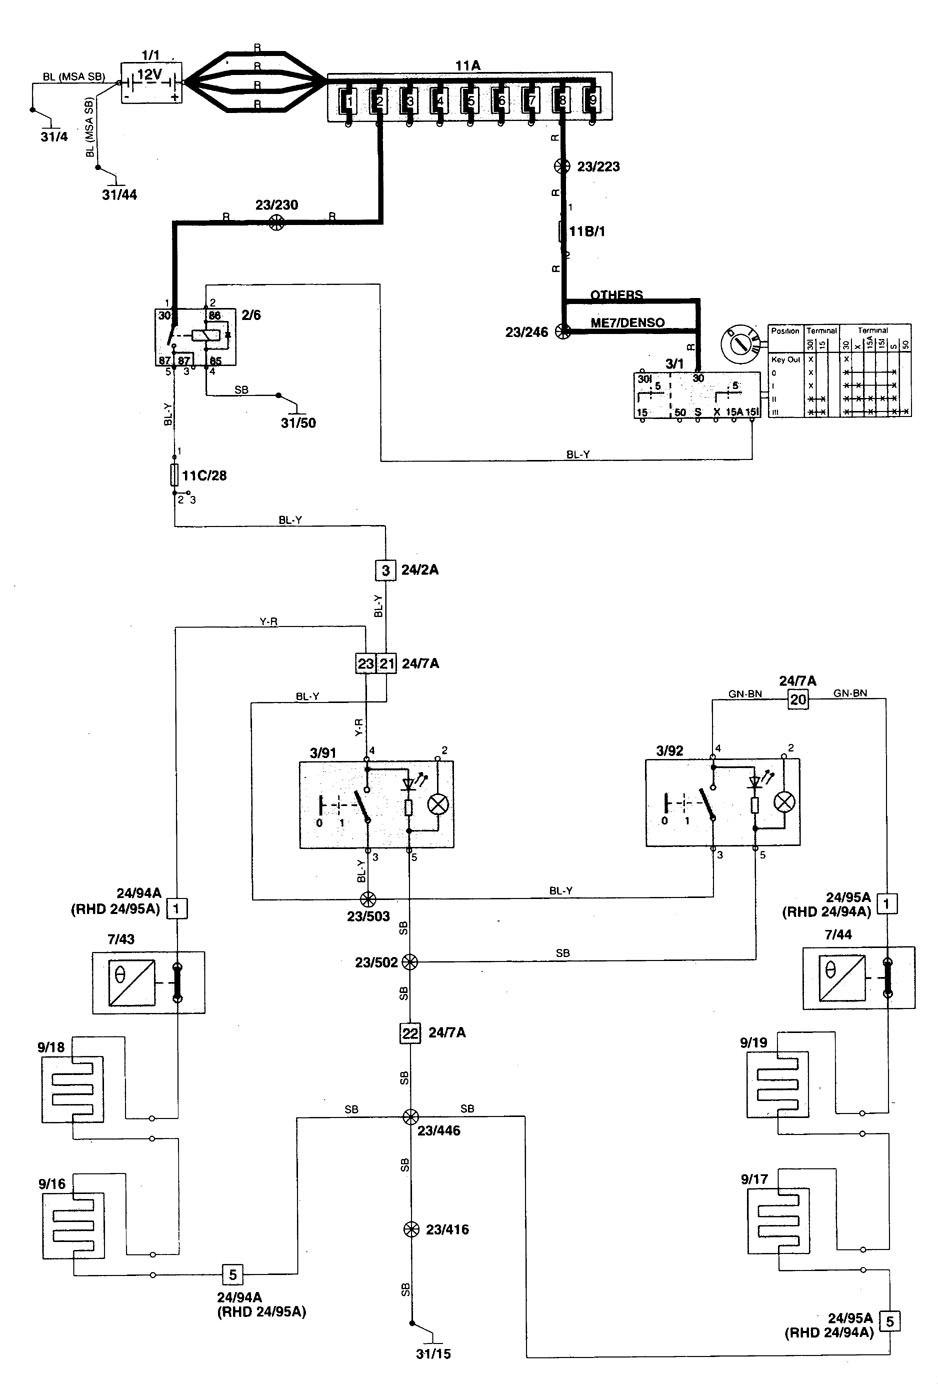 1999 volvo s70 wiring diagram